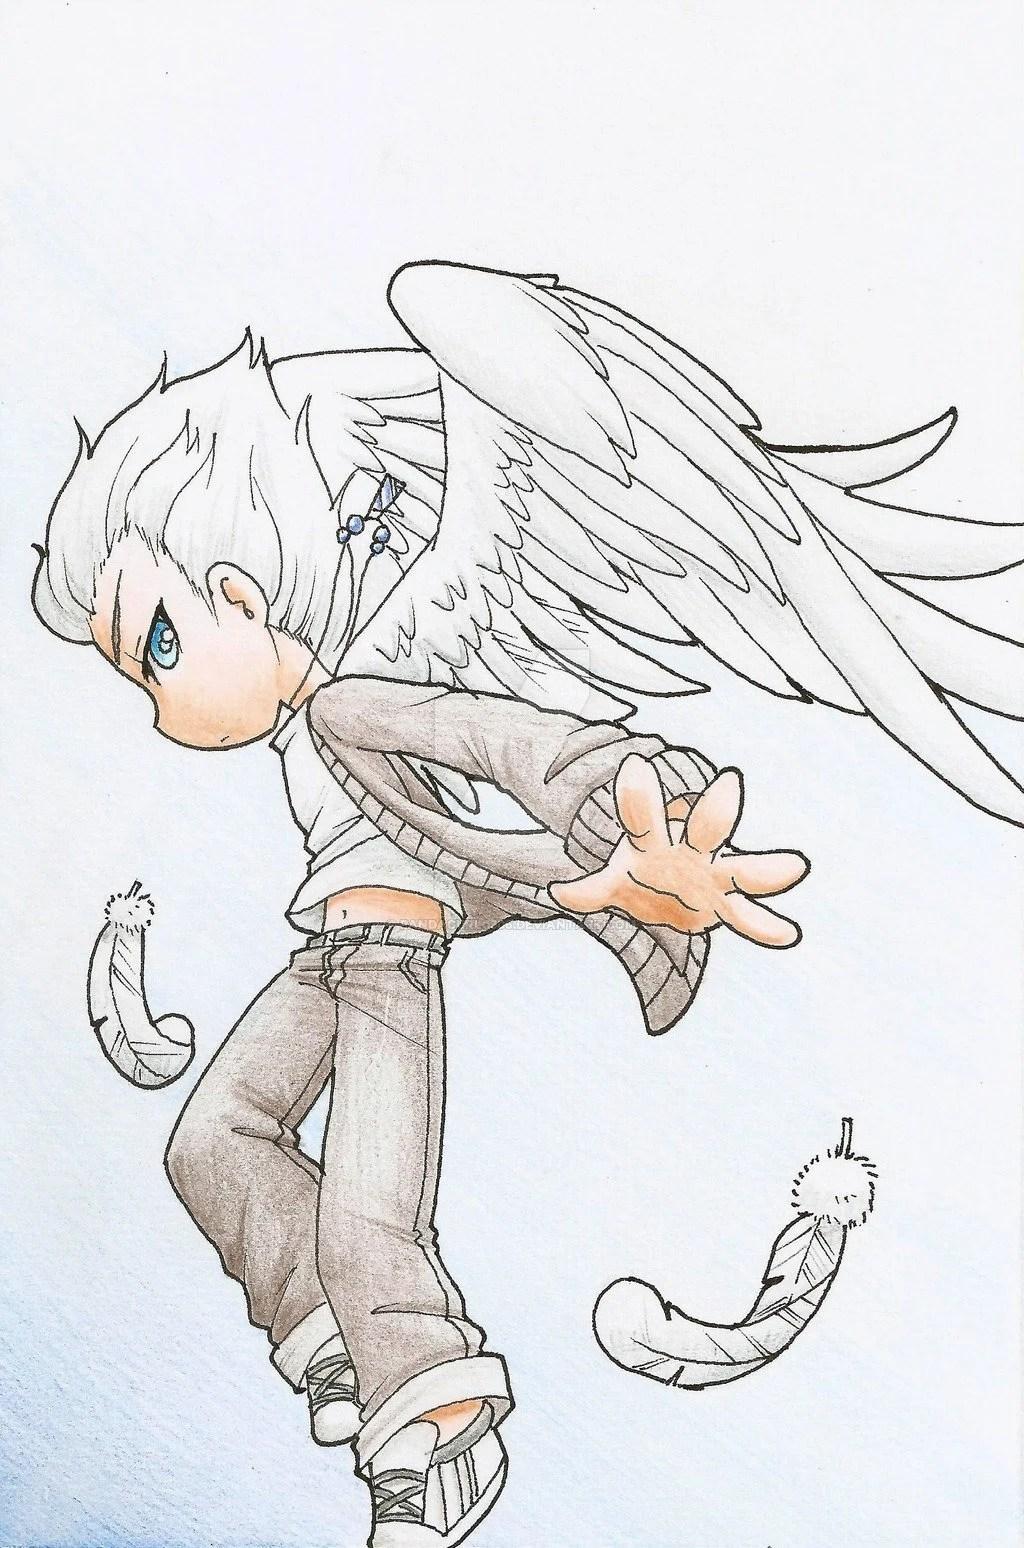 Chibi Angel Wings : chibi, angel, wings, Anime, Angel, Wings, Chibi